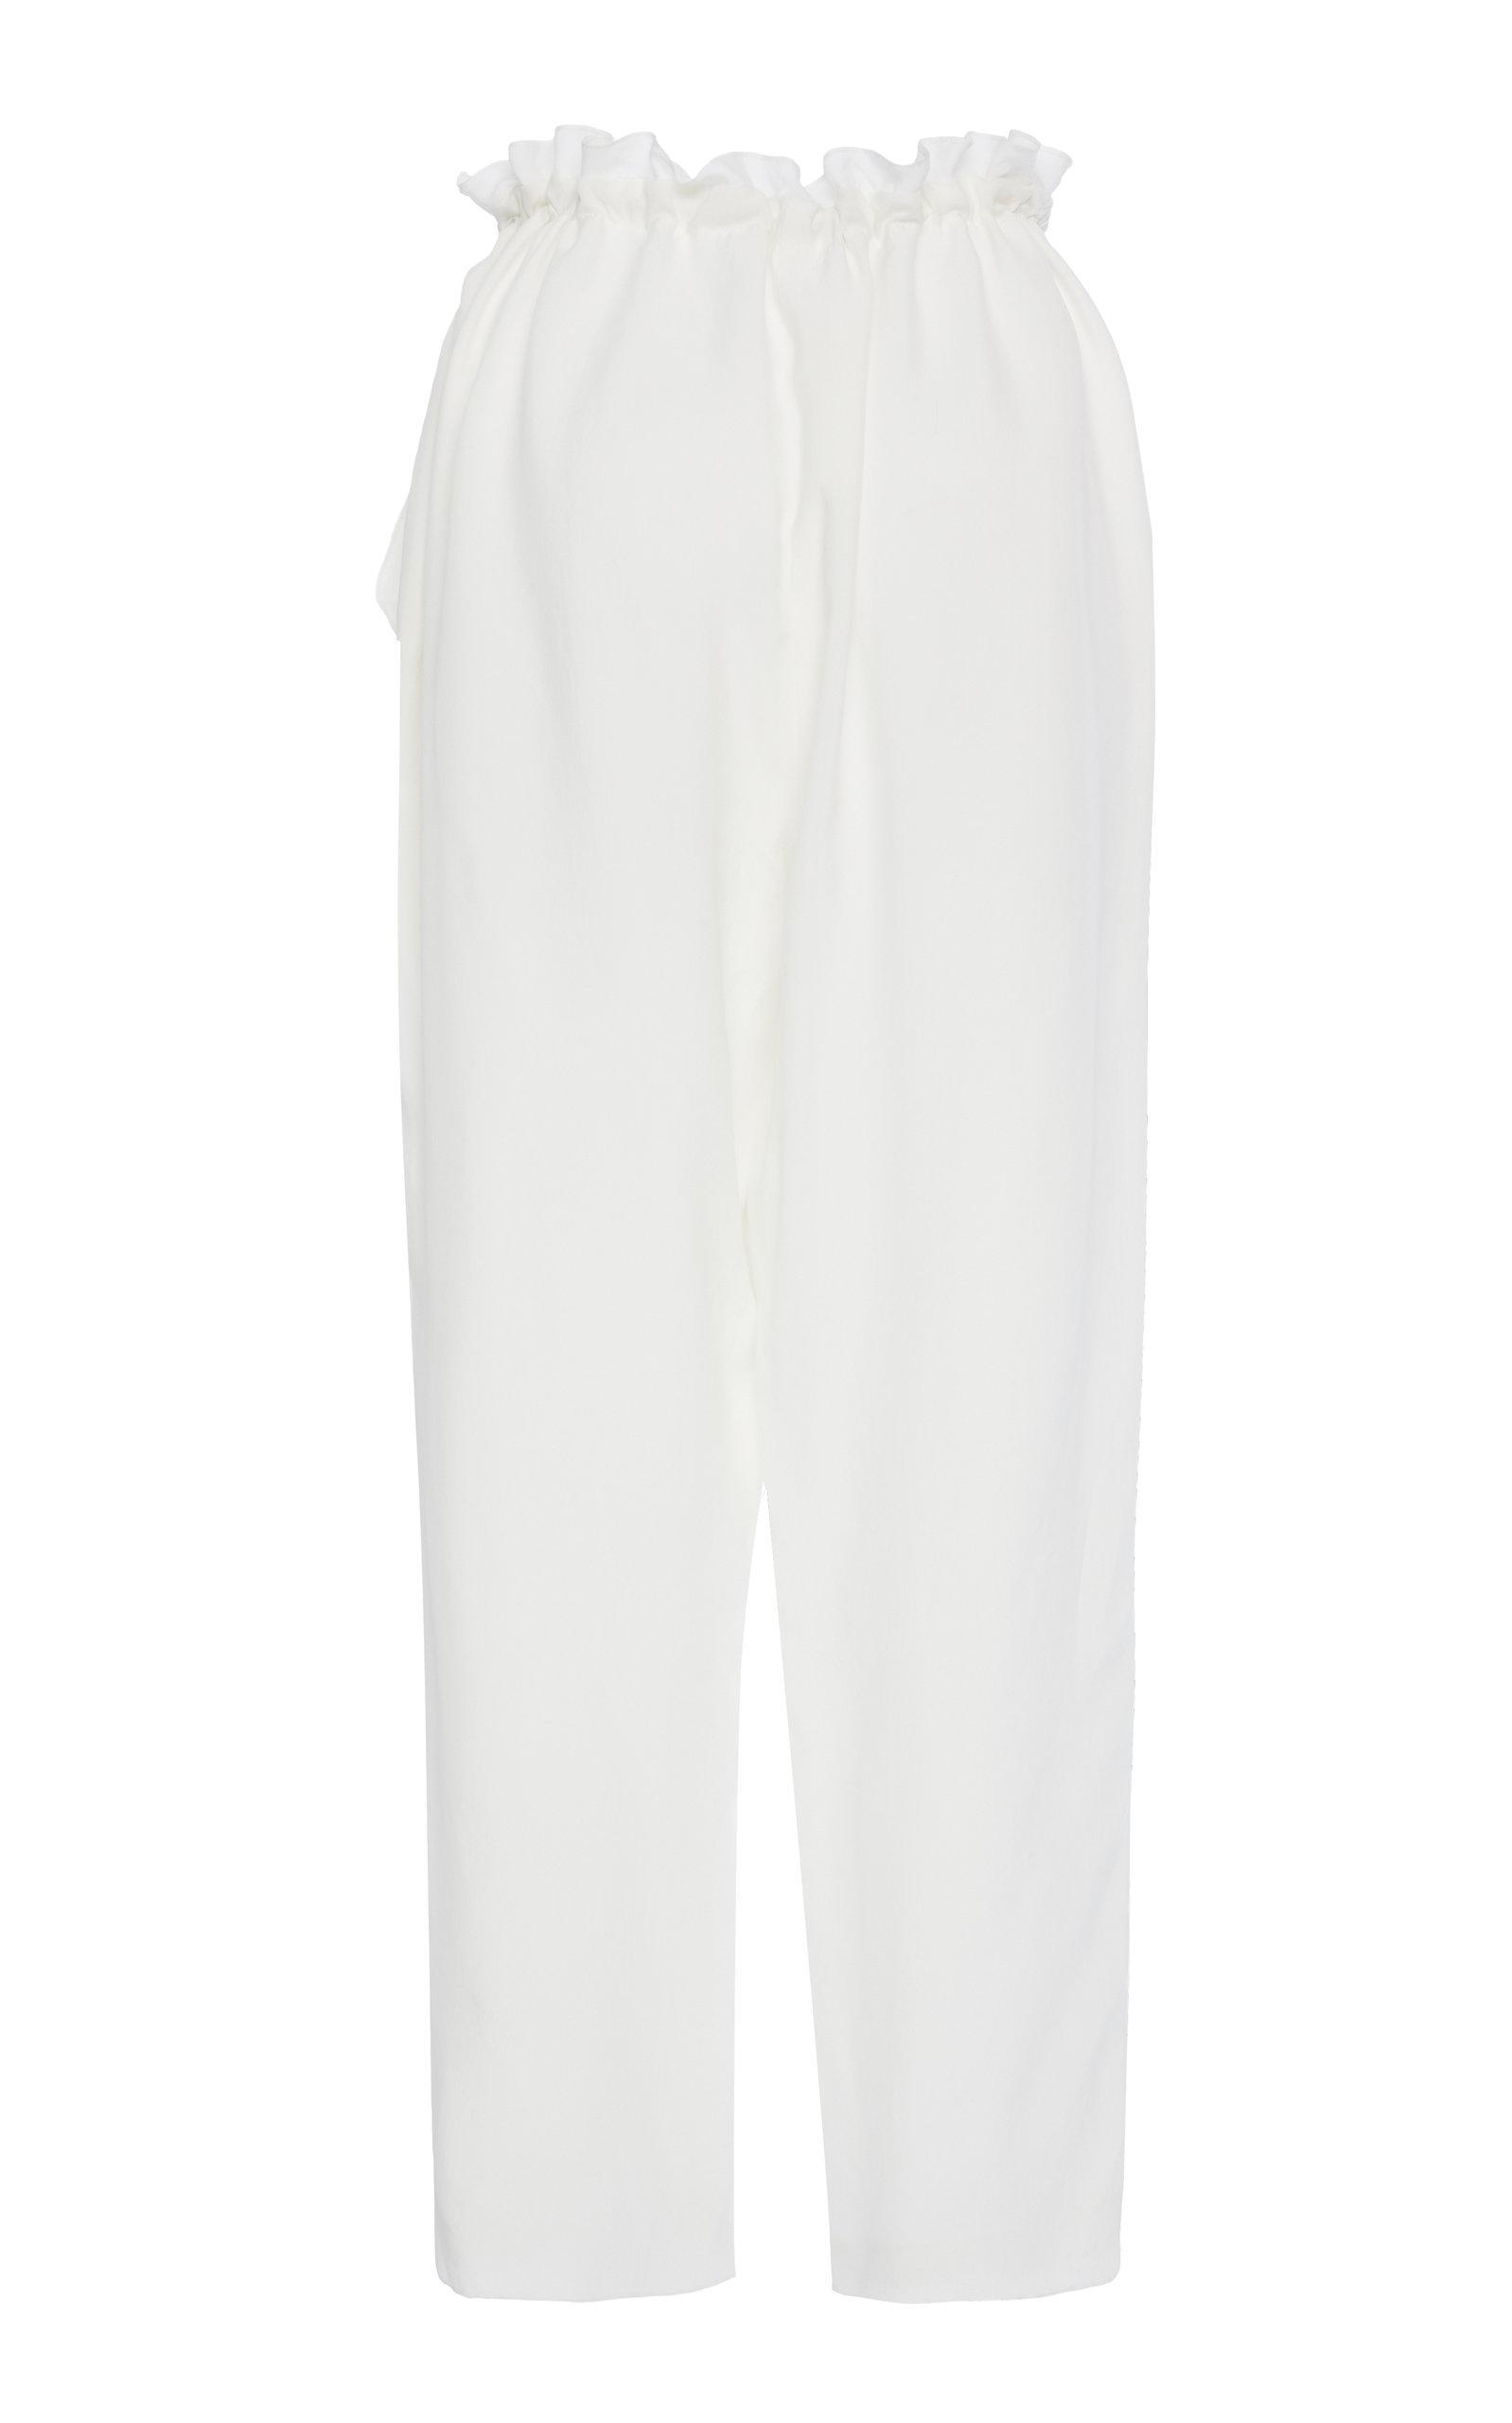 Léger Cupro Recadrée Pantalon Cordon De Serrage Sally Lapointe 7Ib4JXrvfl